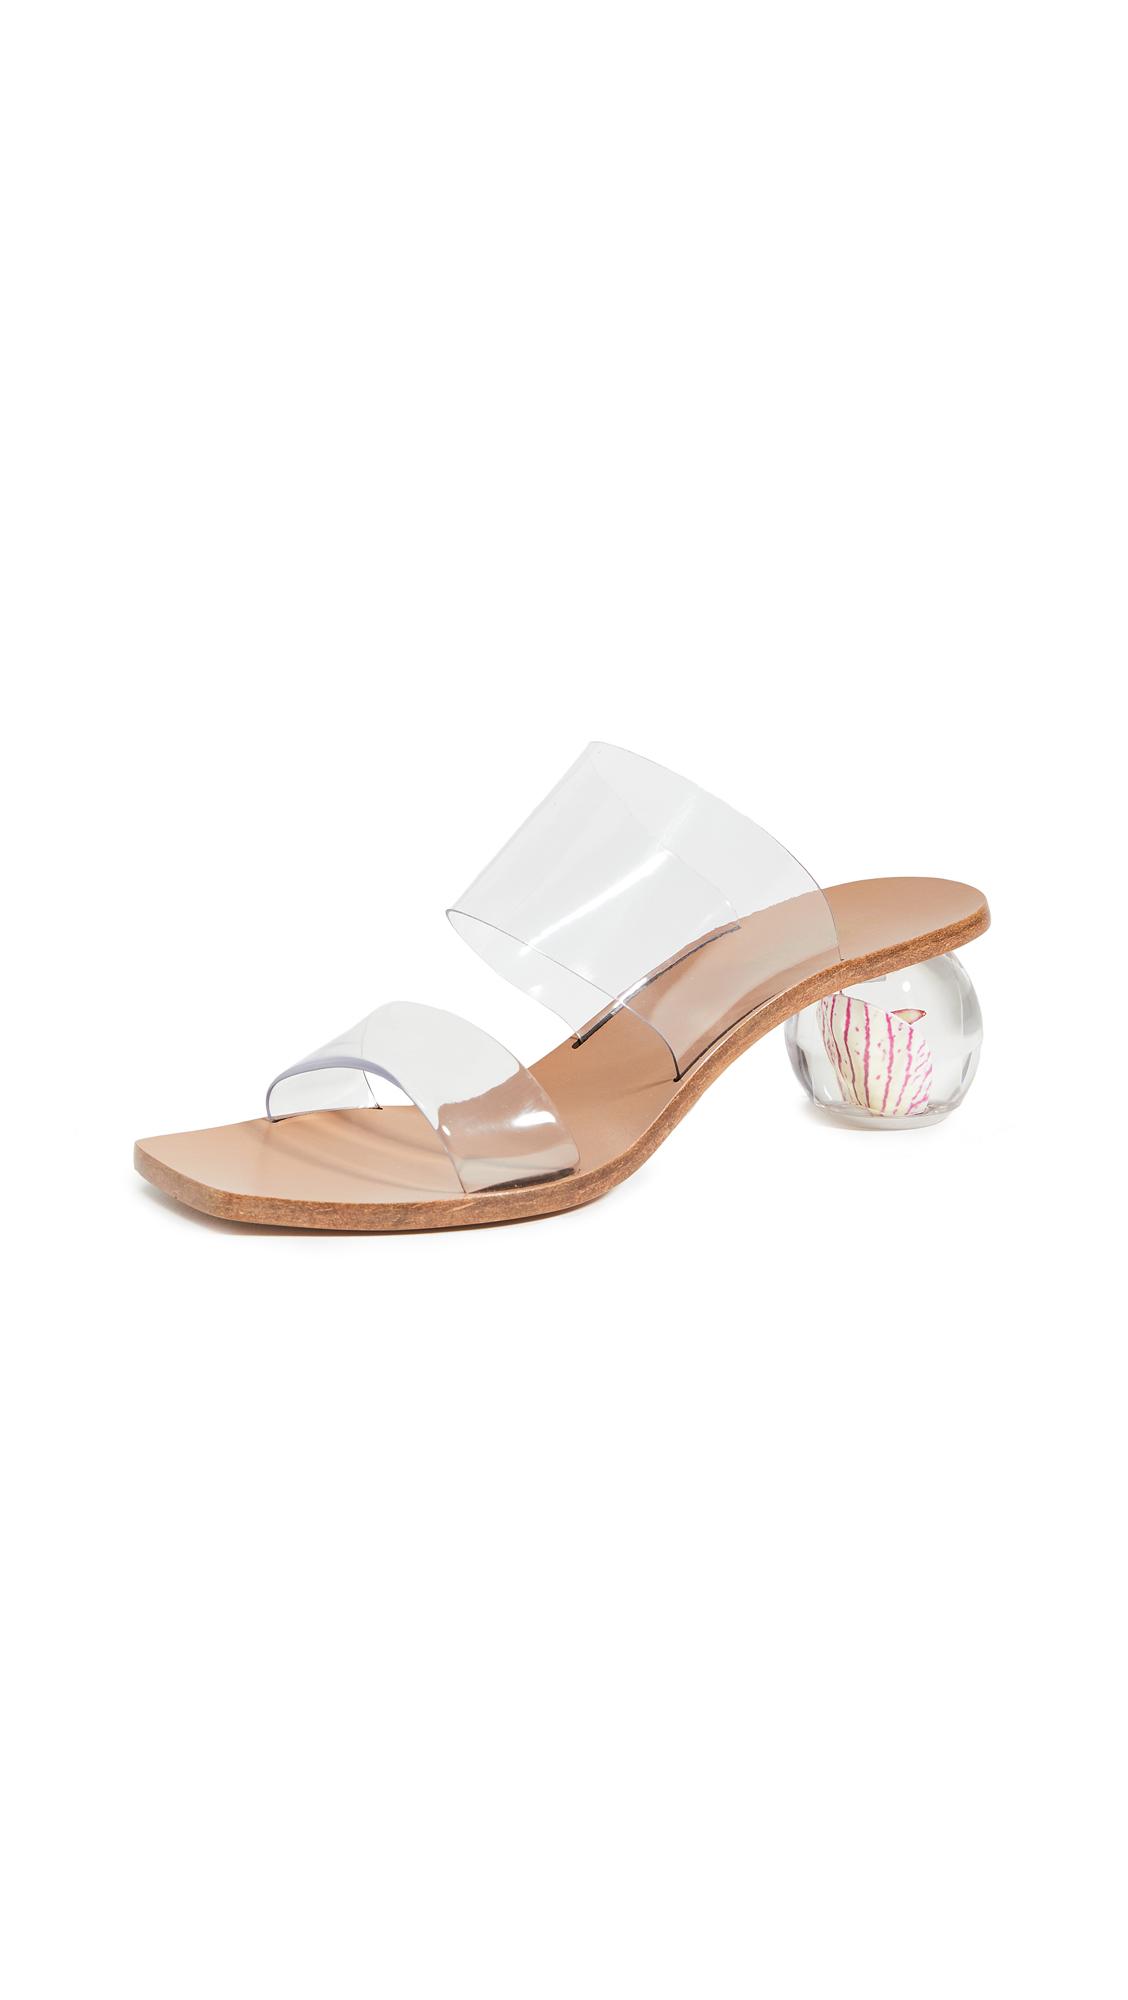 Buy Cult Gaia Jila Flower Heel Sandals online, shop Cult Gaia